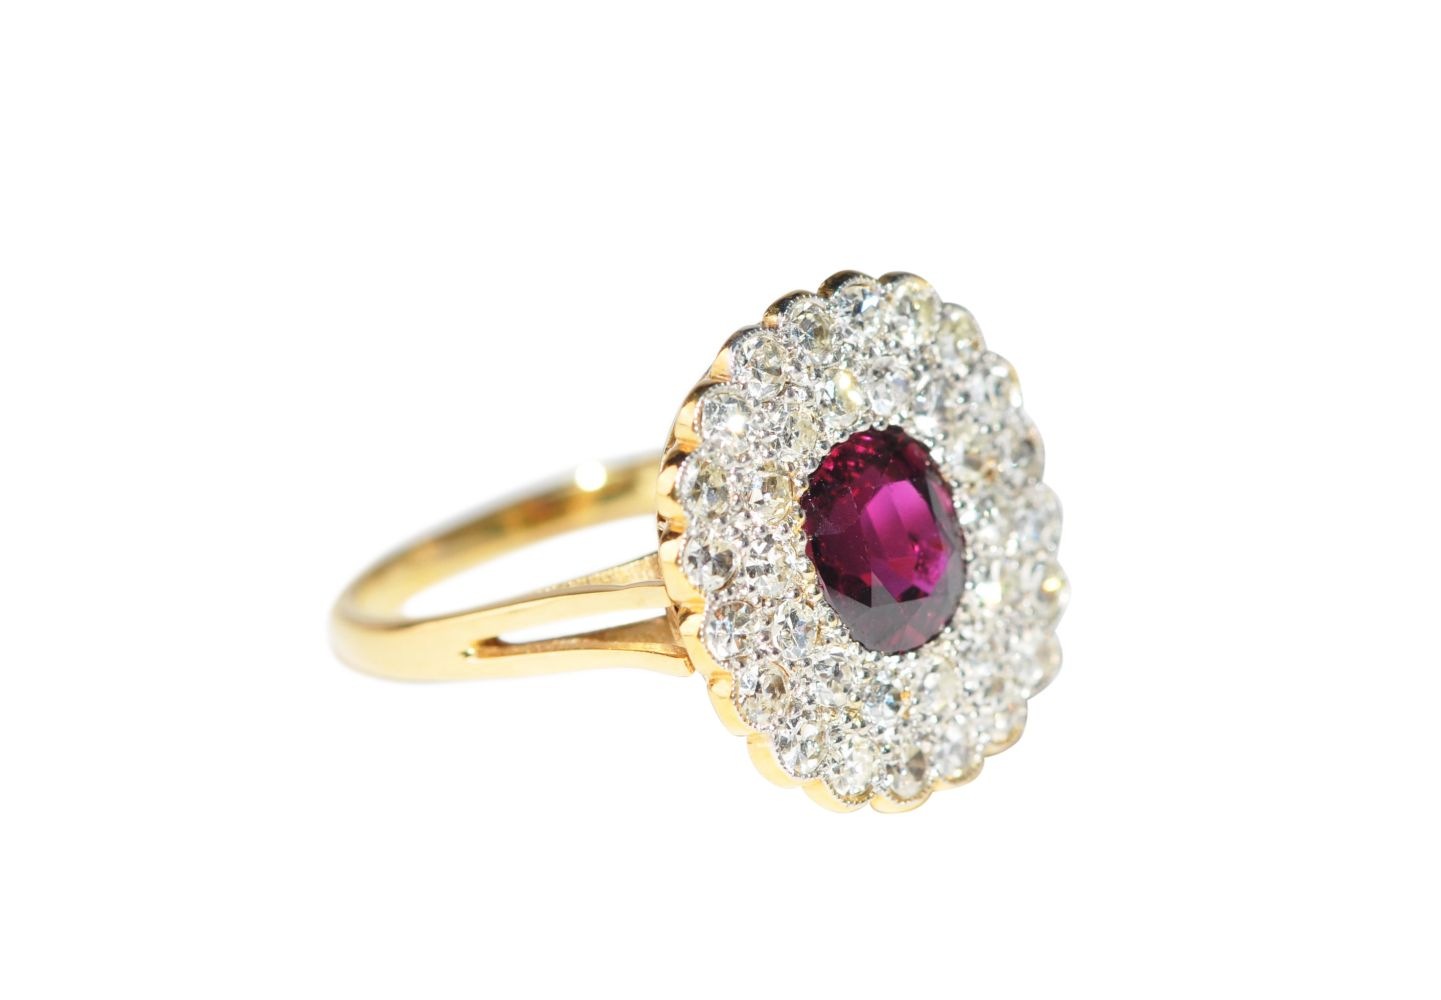 #128 Brilliant ring with ruby untreated | Brillantring mit Rubin unbehandelt Image